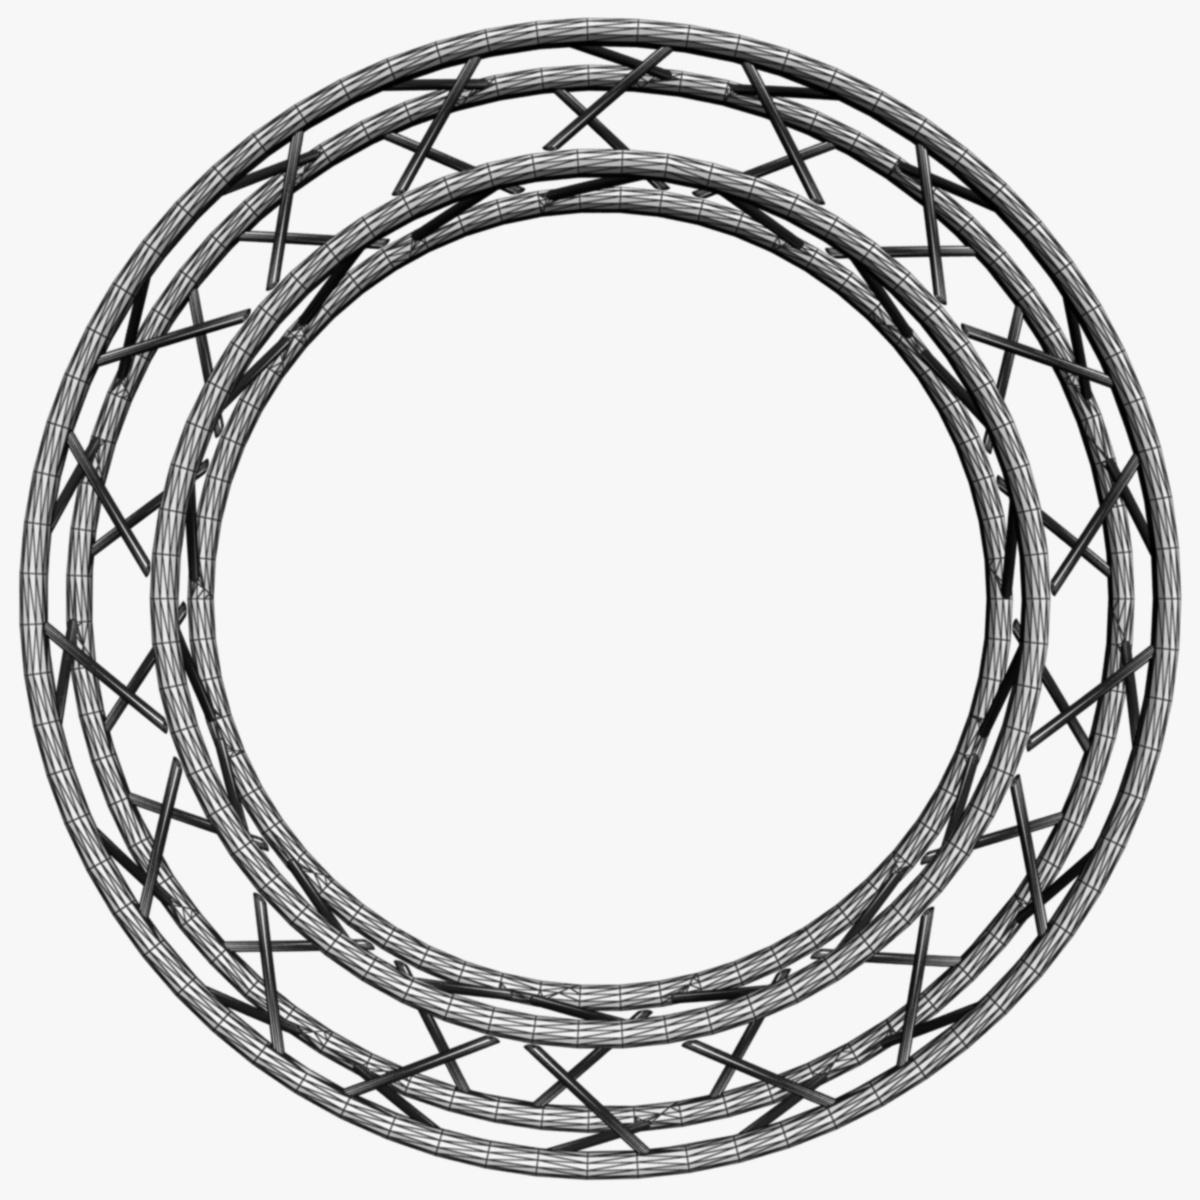 дугуй дөрвөлжин Дотоод (бүрэн диаметр 200cm) 3d загвар 3ds max dxf fbx c4d dae obj 252369